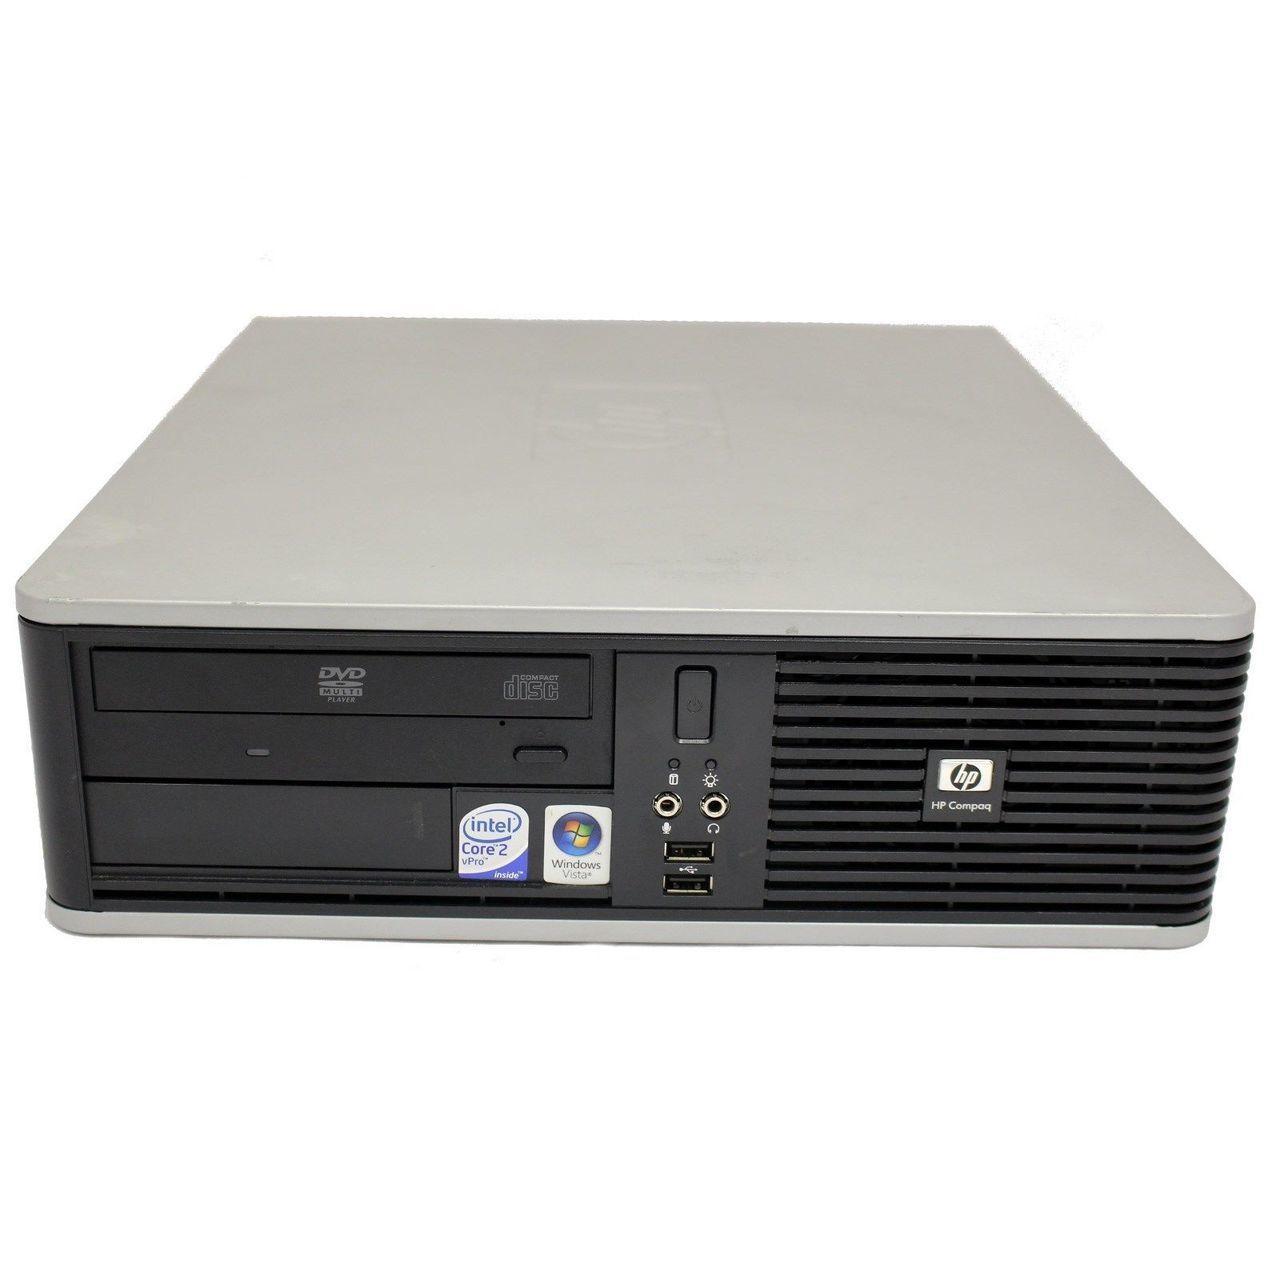 Системный блок, компьютер, AMD Athlon 64 X2 4200, 2 ядра по 2,2 Ггц, 8 Гб ОЗУ, HDD 500 Гб, видео 1 Гб